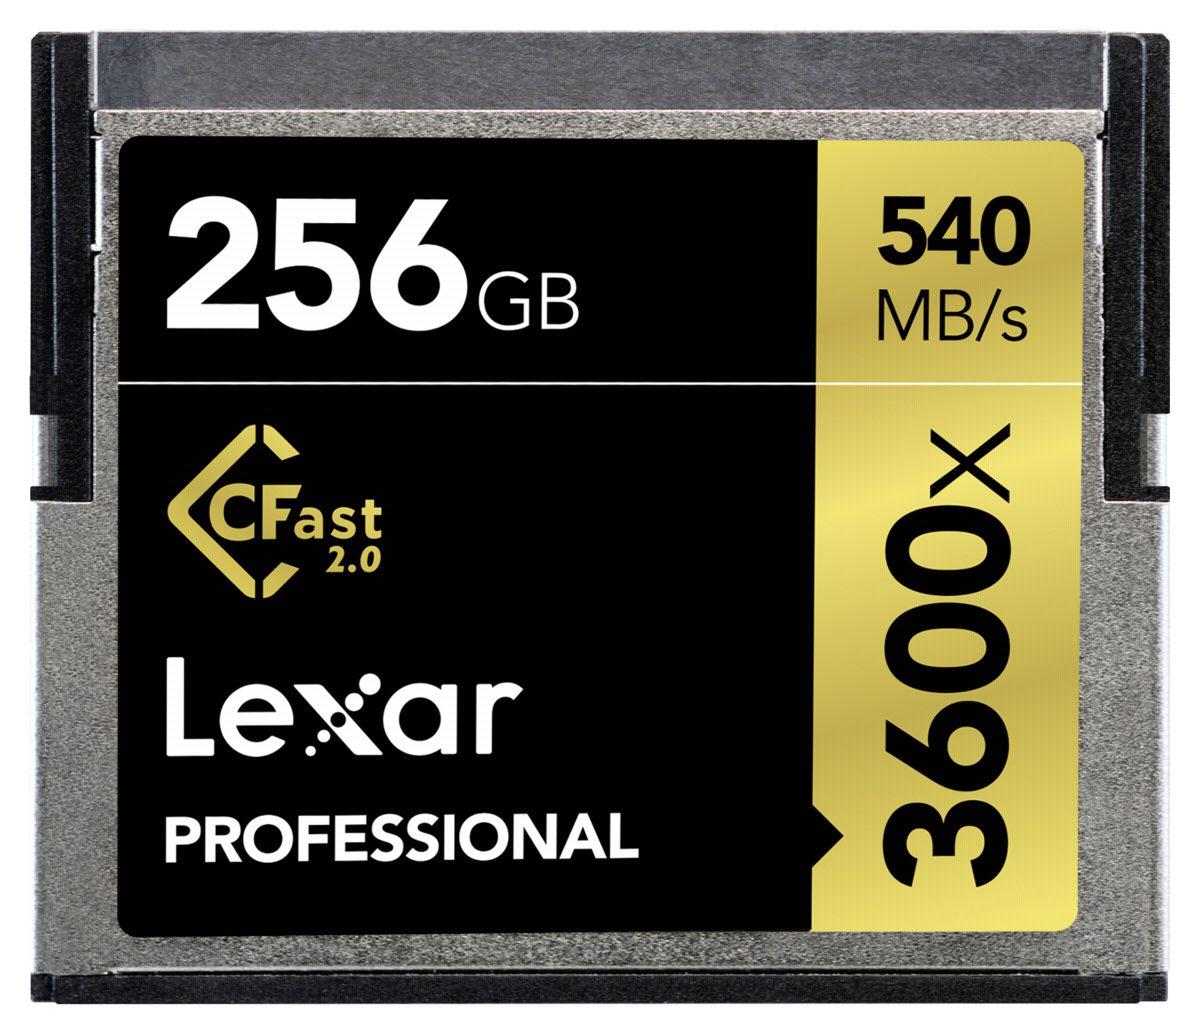 Lexar Speicherkarten »CFast 2.0 256GB 3600x Professional«